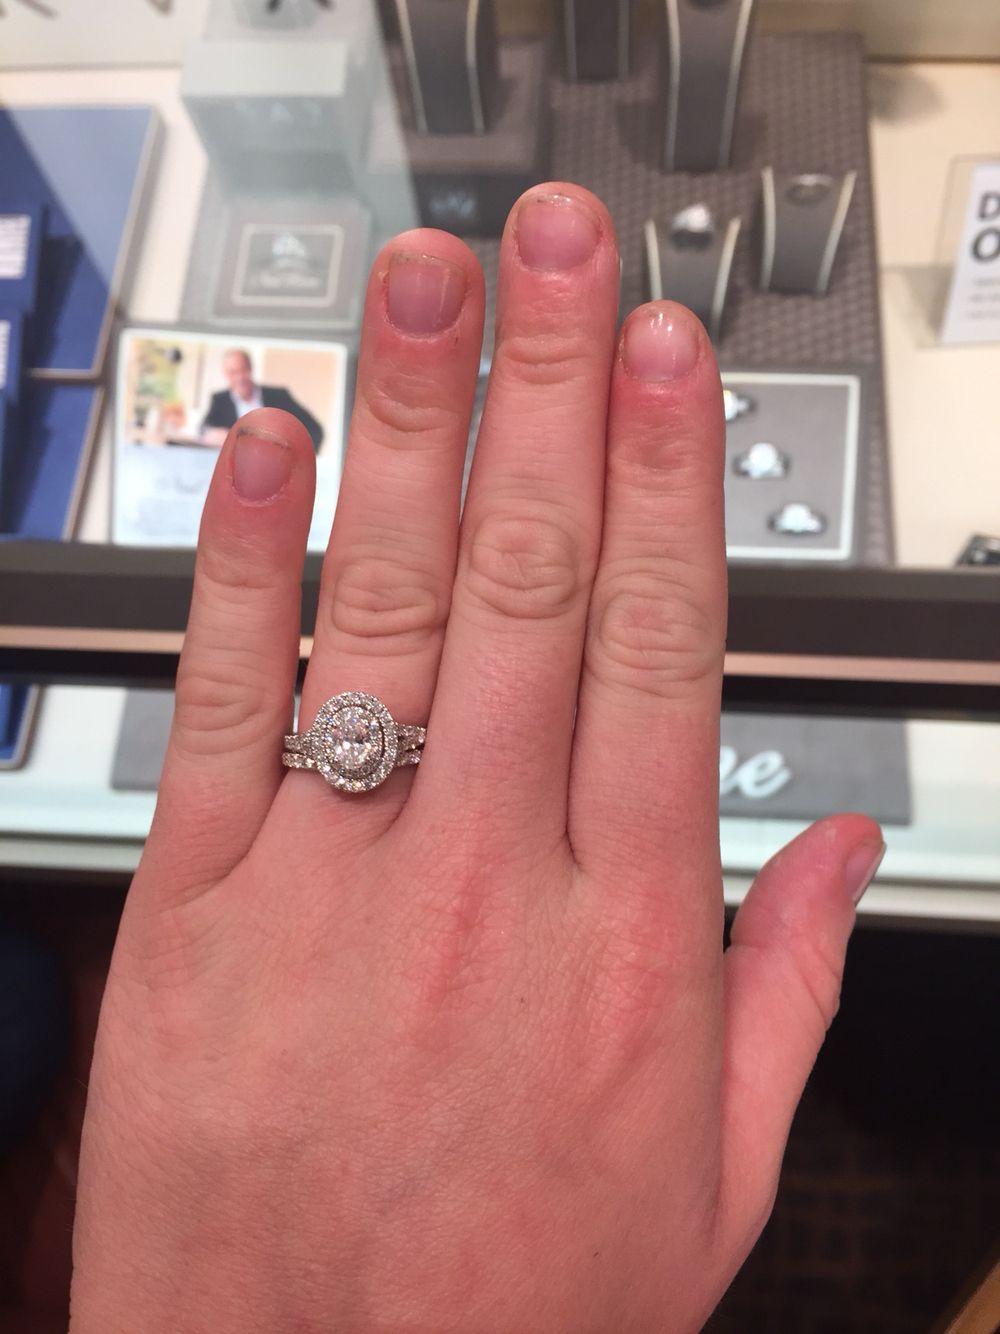 neil lane wedding rings Neil Lane 1ct double halo oval engagement ring